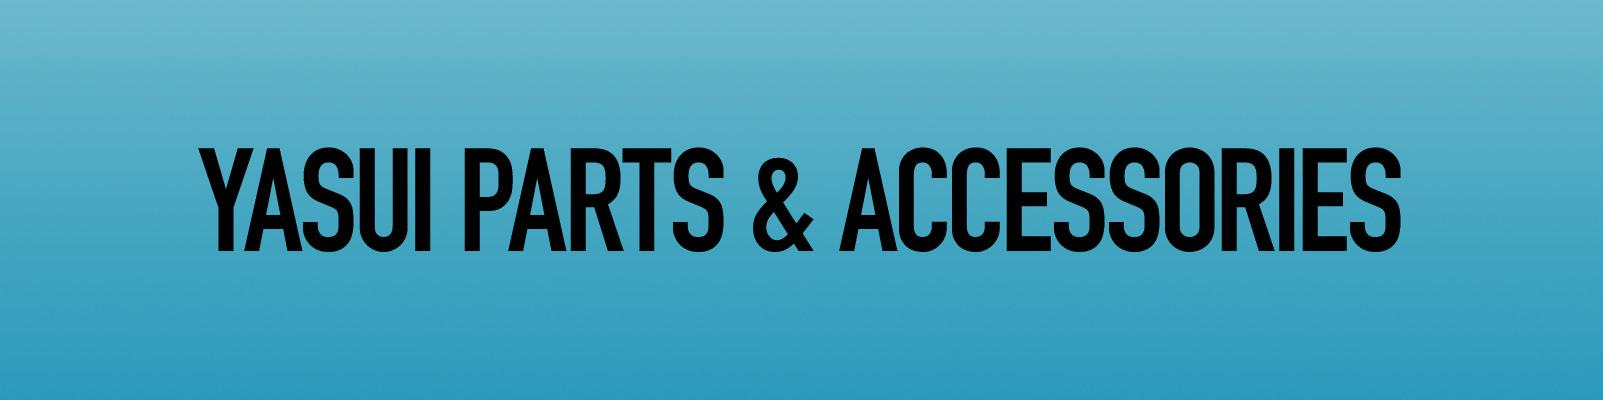 Spare Parts & Accessories